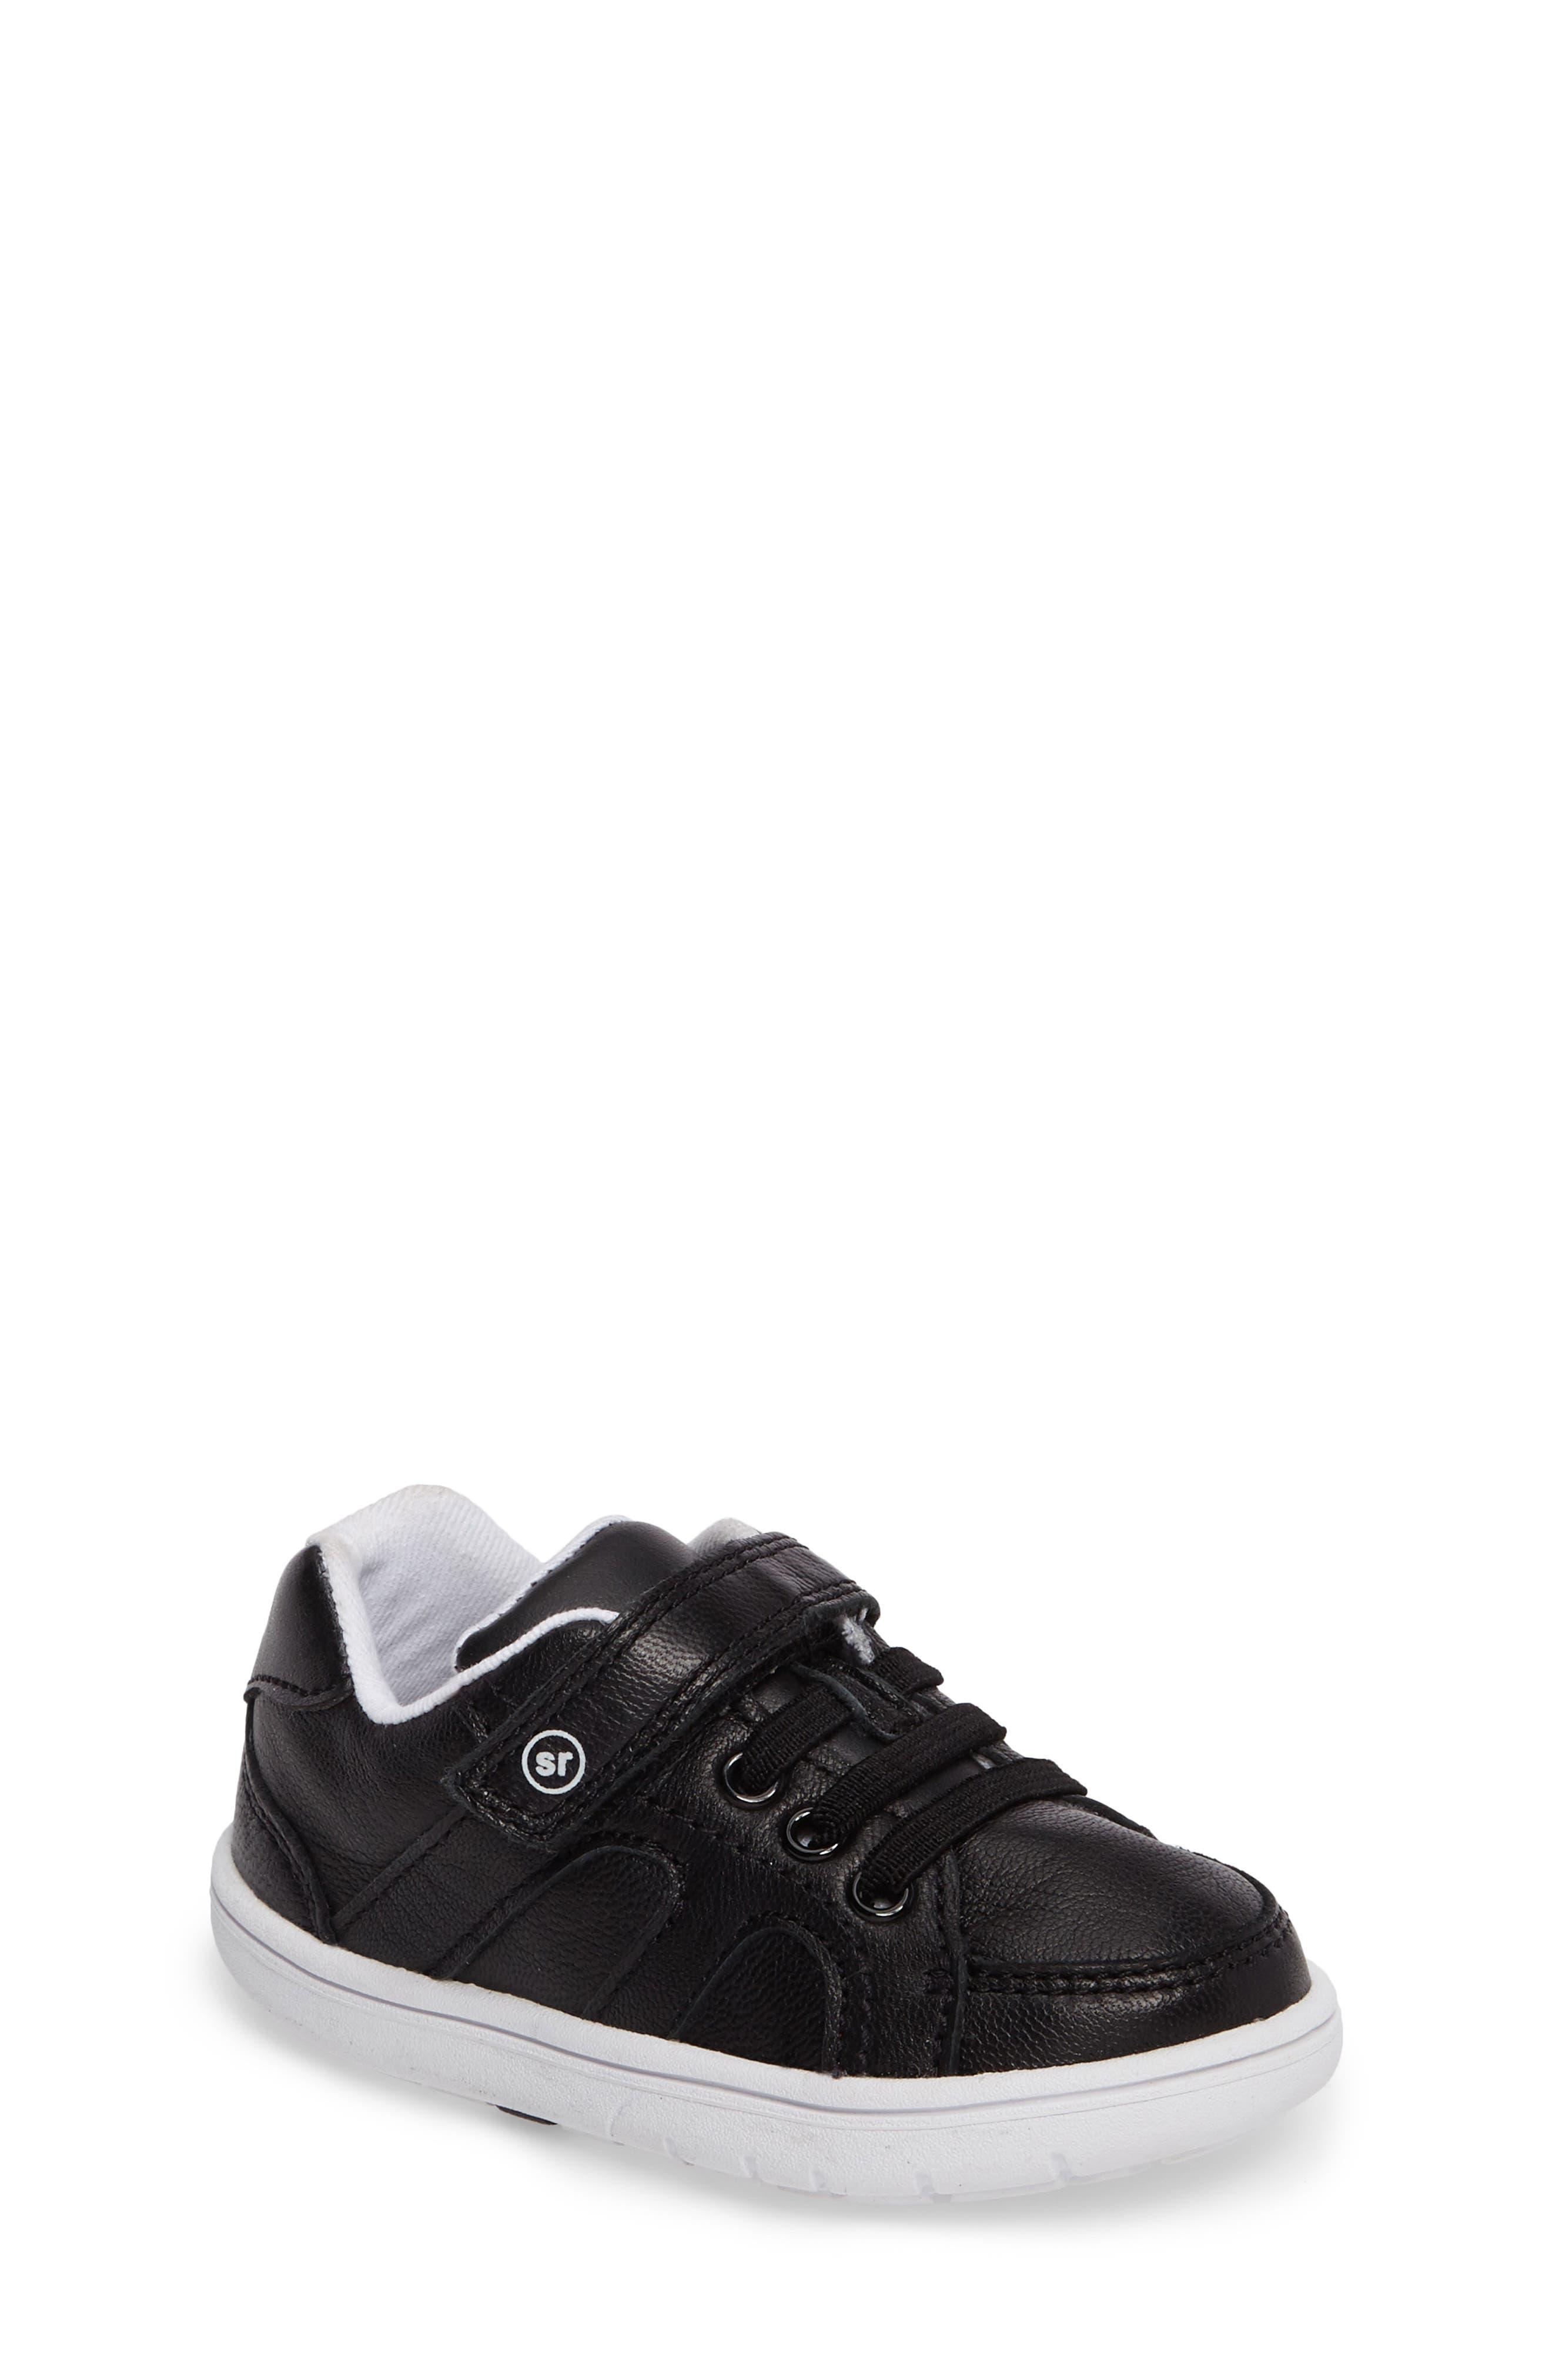 SRT Noe Sneaker,                             Main thumbnail 1, color,                             BLACK